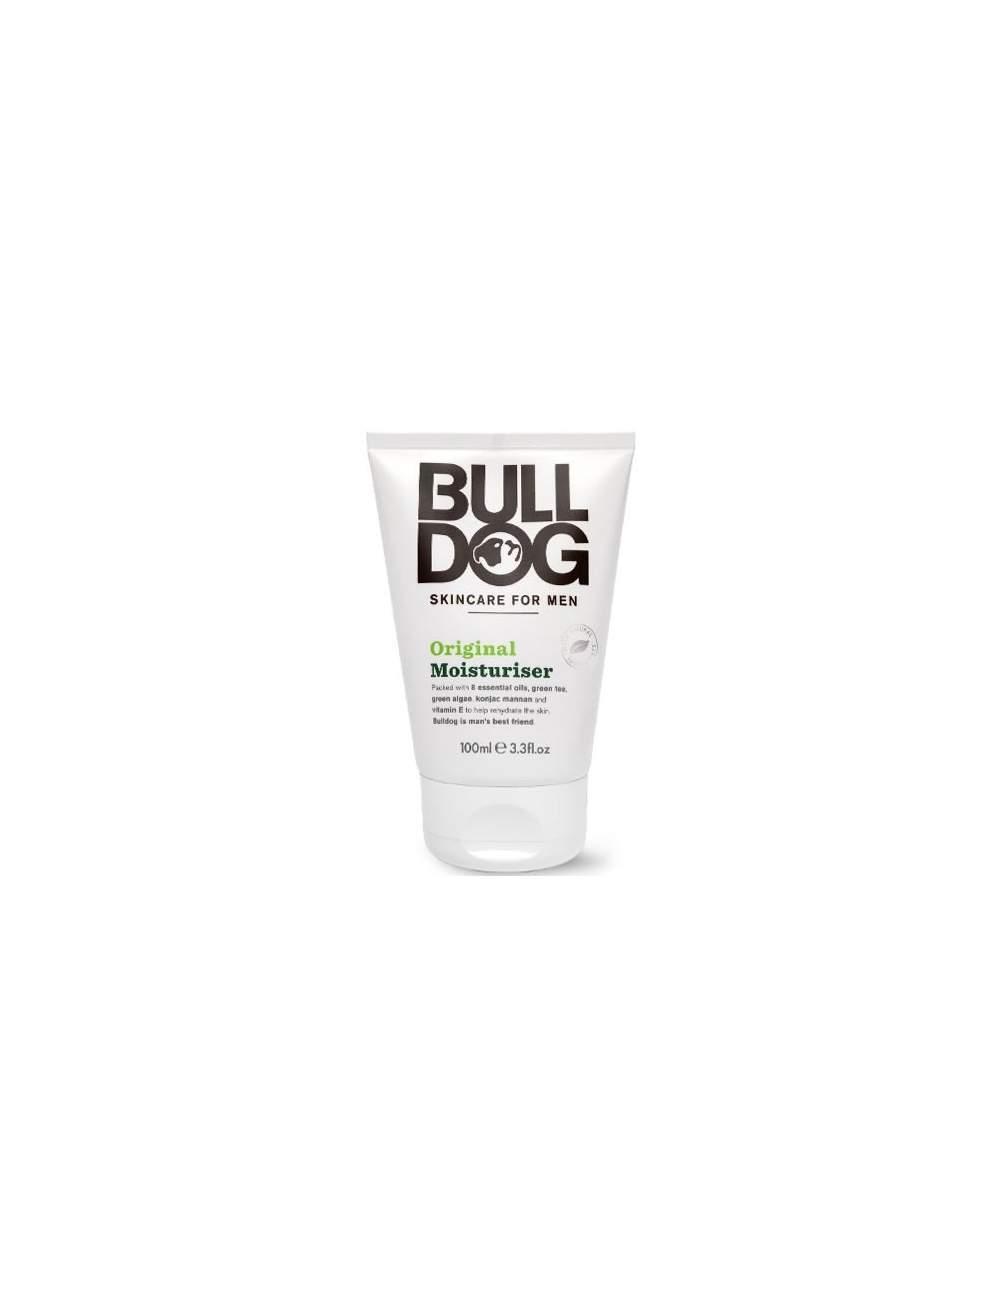 Crema Facial Hidratante Natural para Hombres Original. Bulldog Skincare